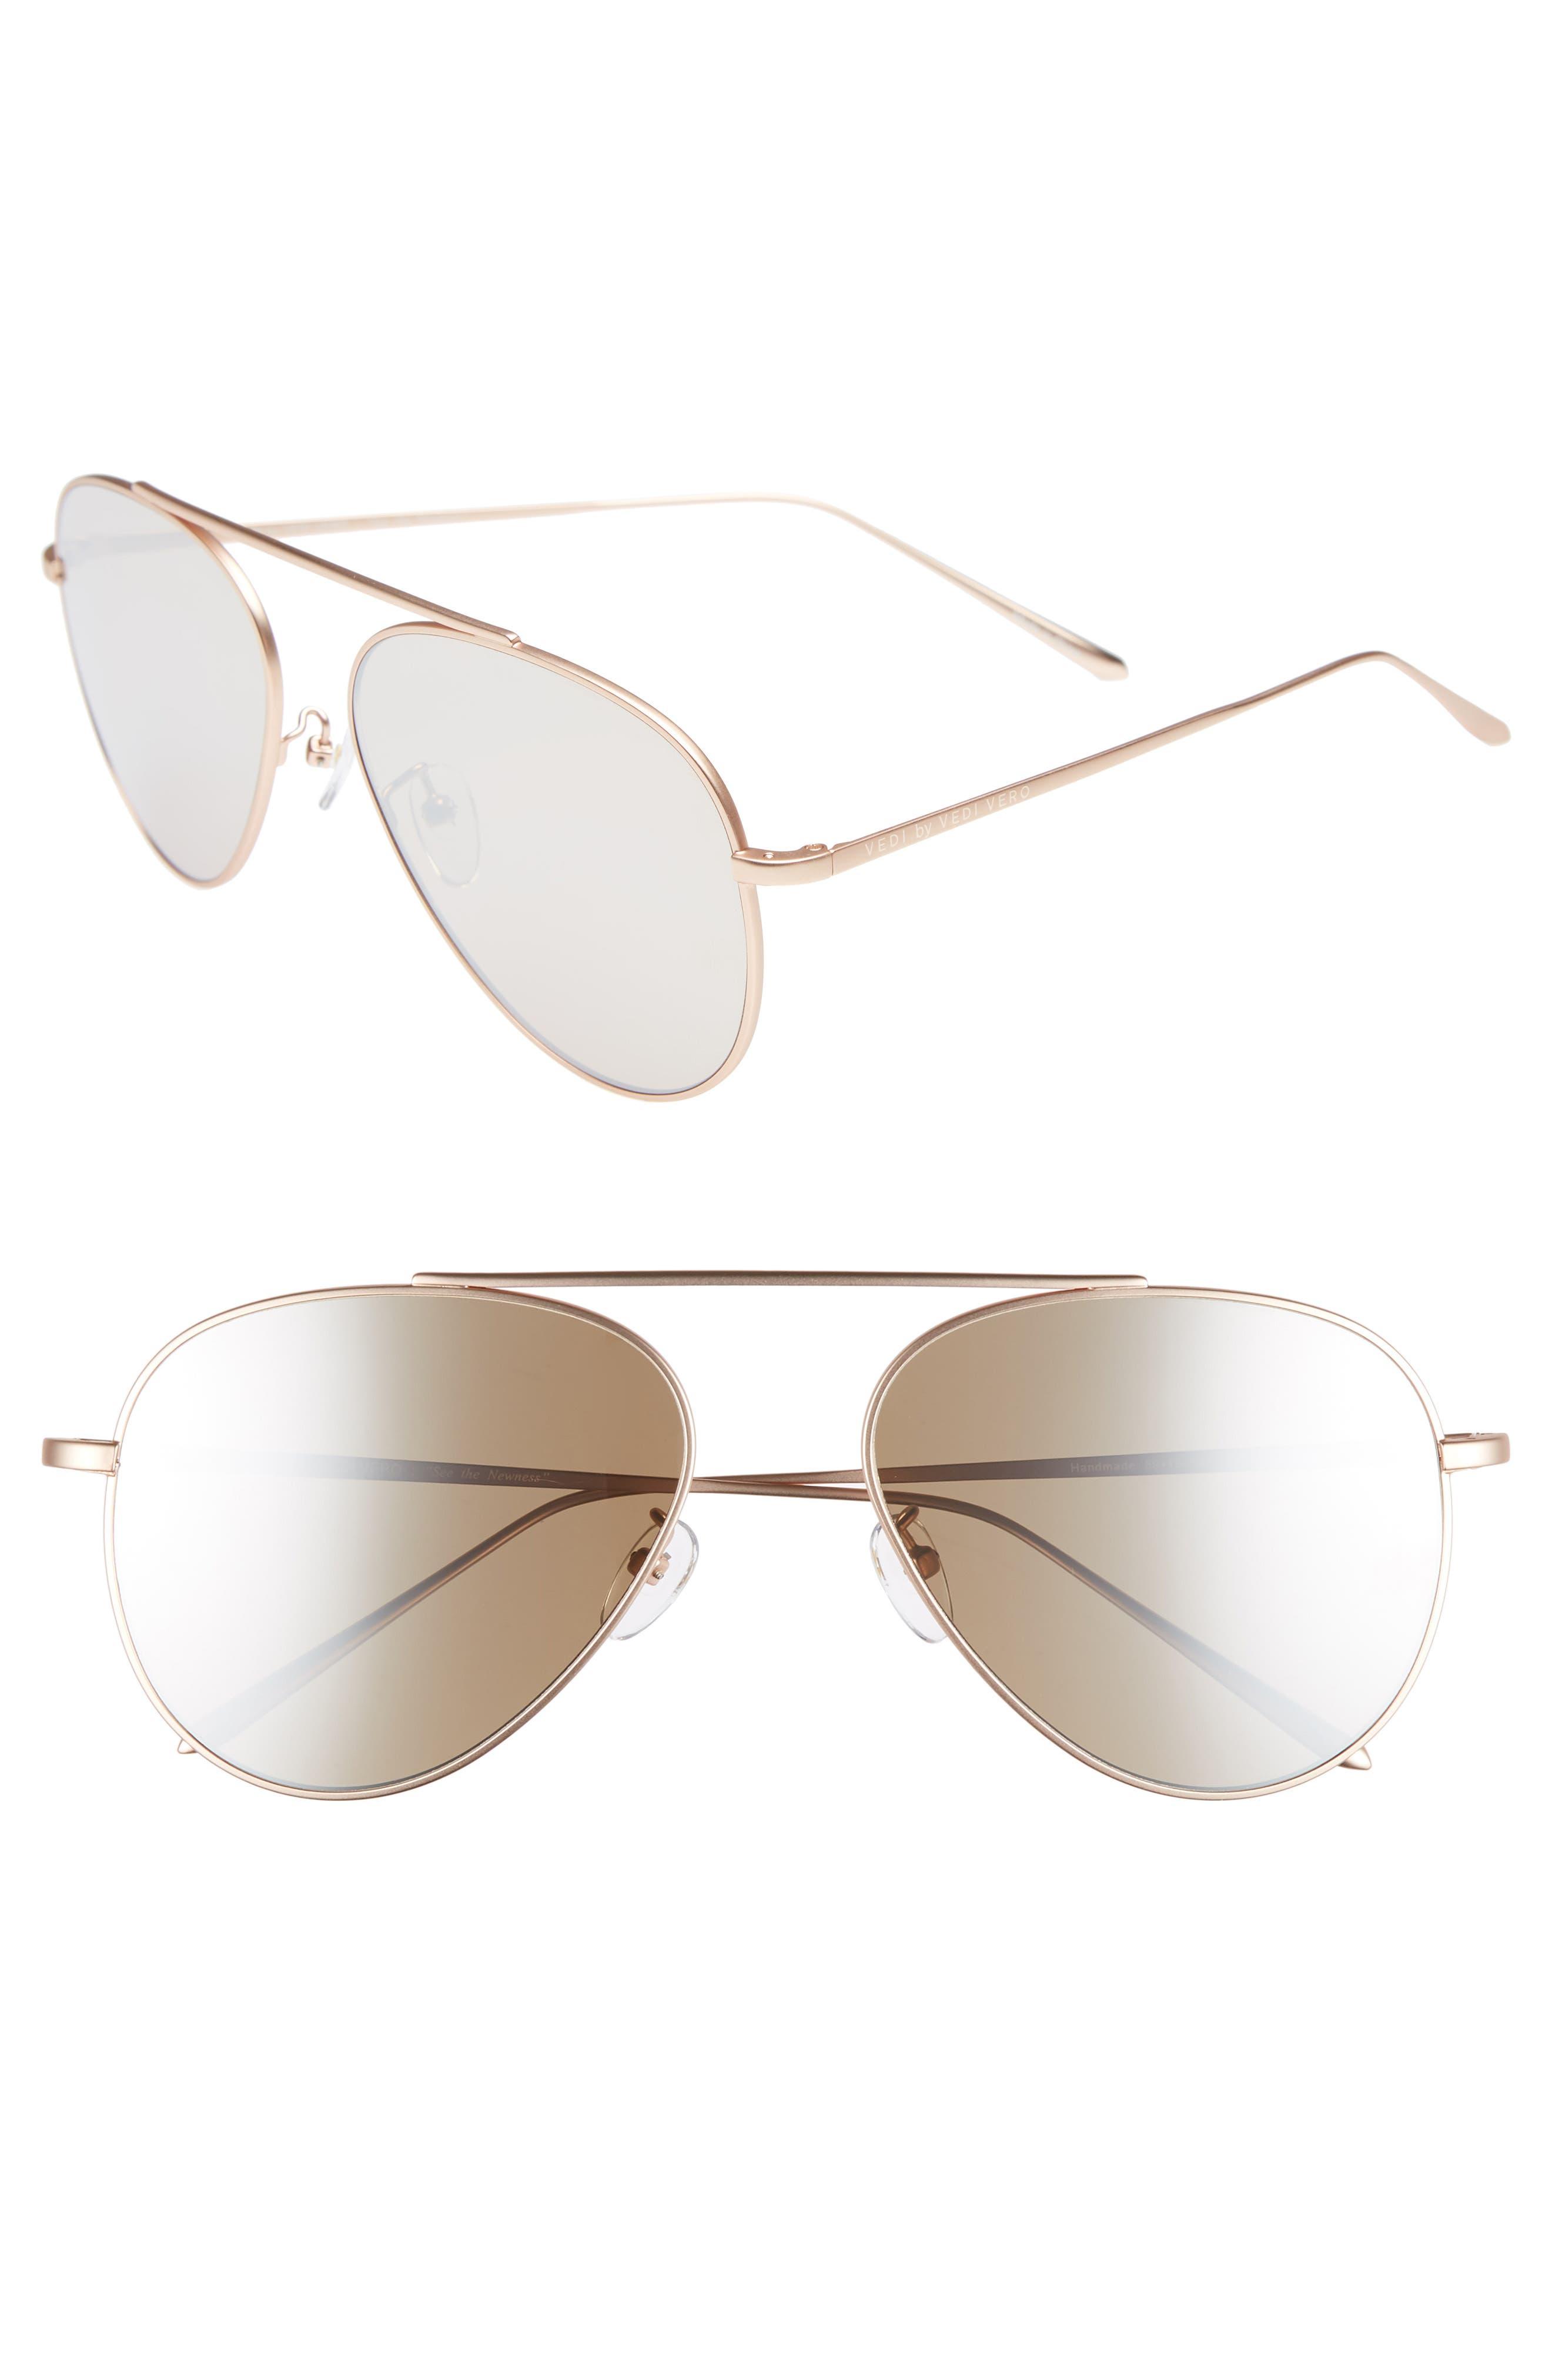 59mm Metal Aviator Sunglasses,                             Main thumbnail 1, color,                             ROSE GOLD/GOLD MIRROR